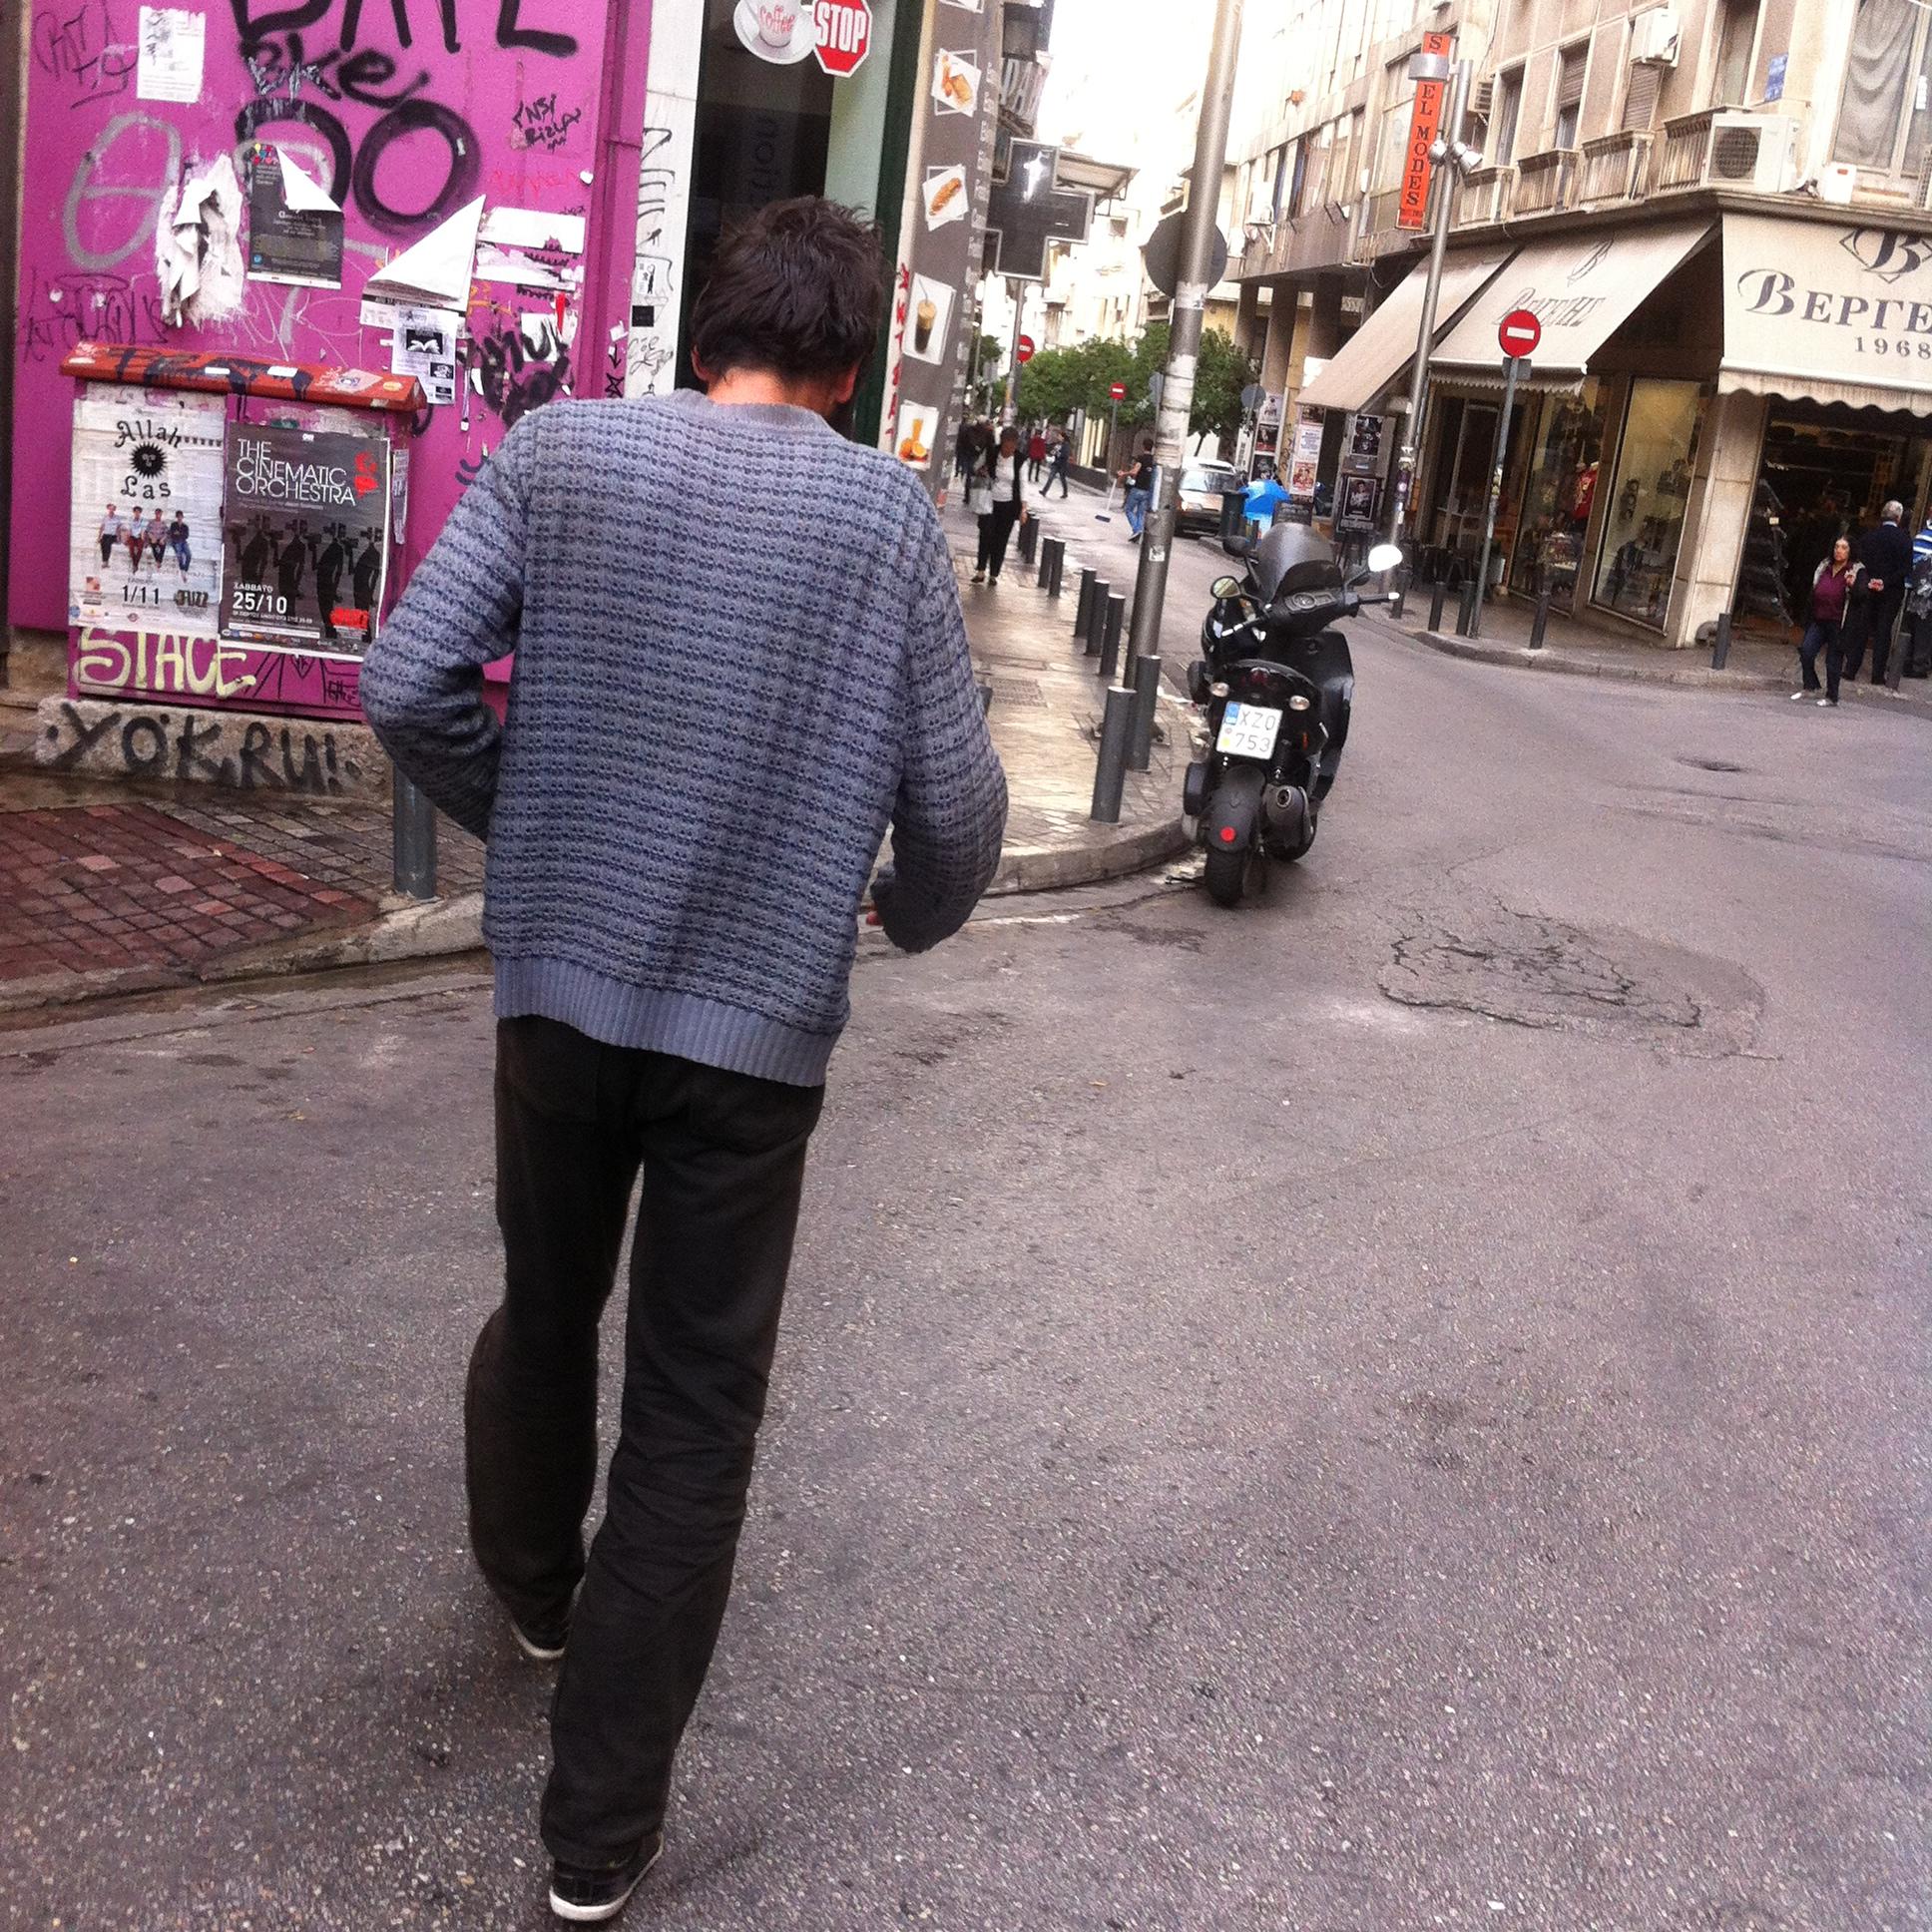 We followed the man smoking a cigarette